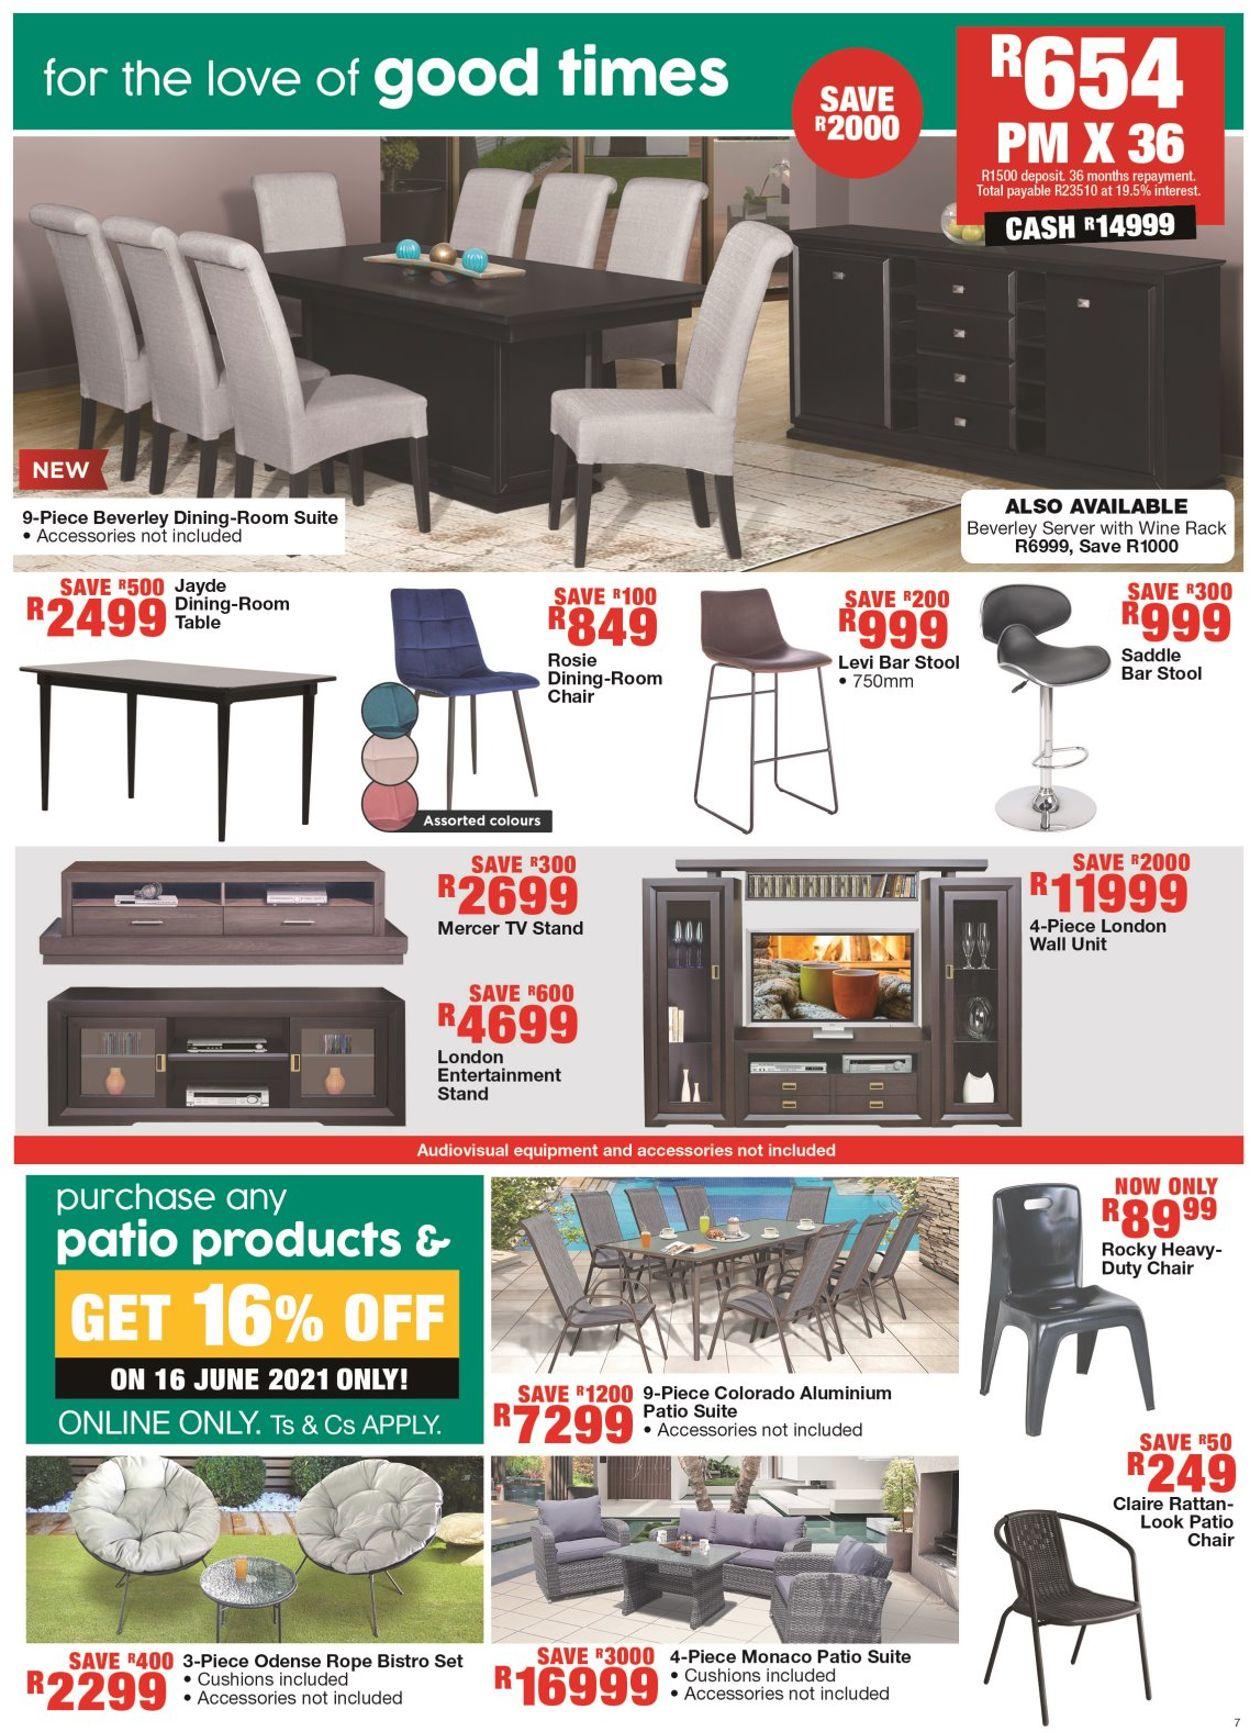 House & Home Catalogue - 2021/06/14-2021/06/20 (Page 7)